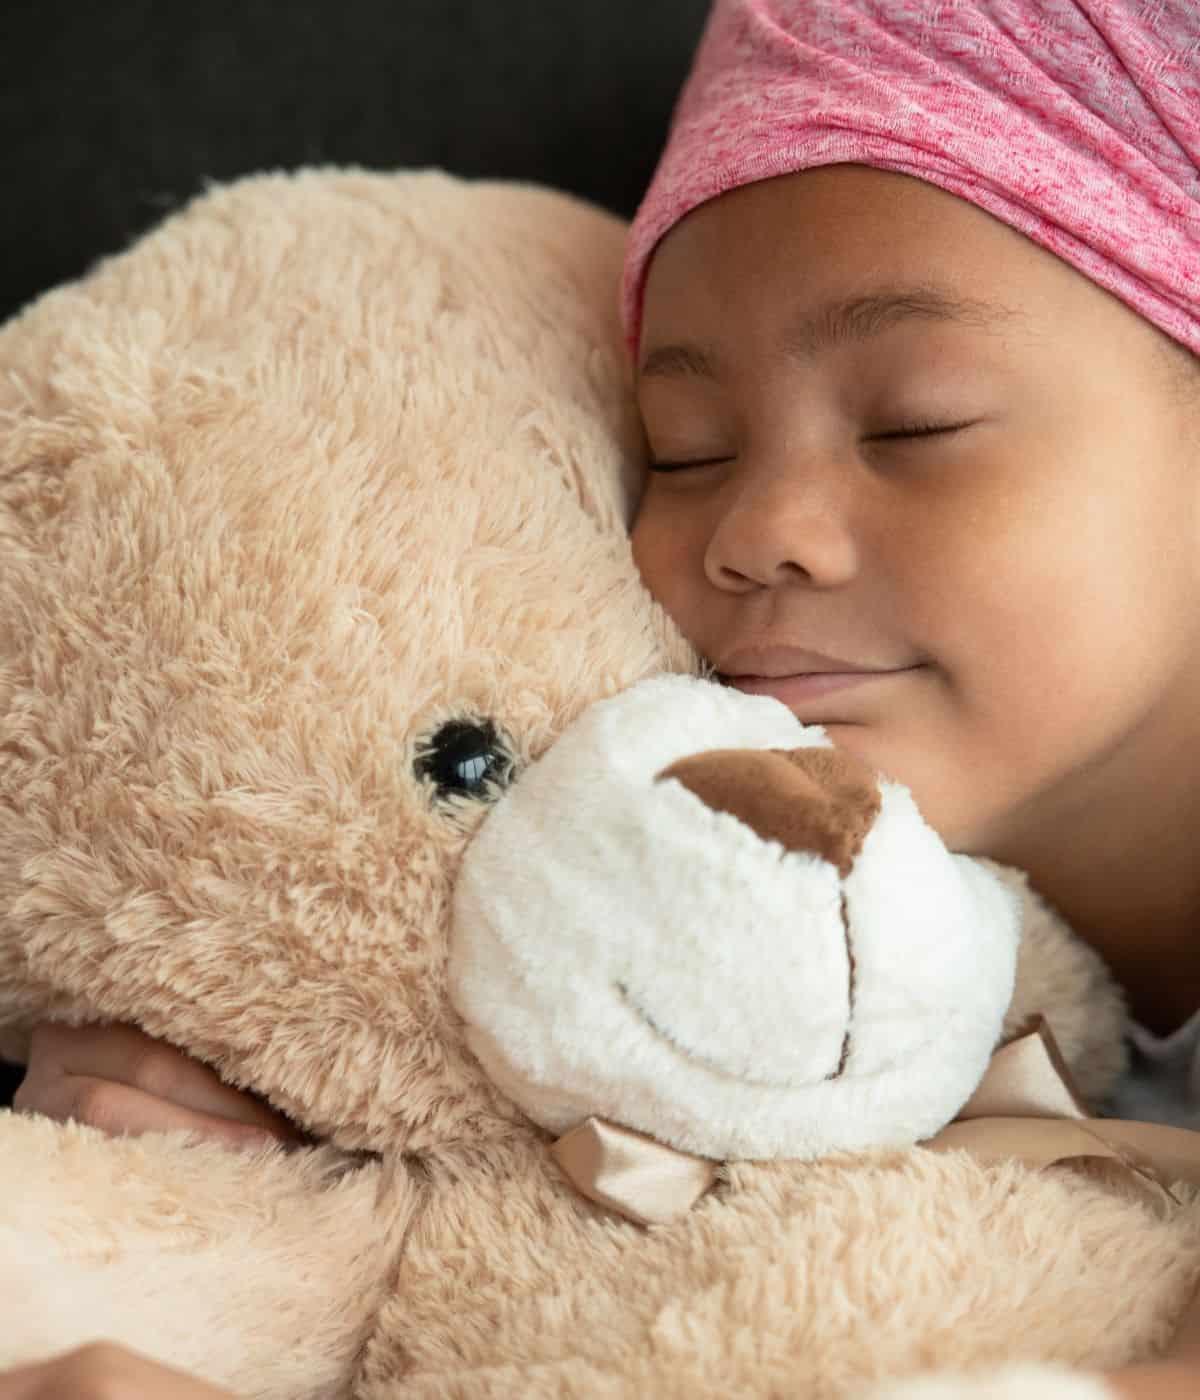 Little girl sleeping with a teddy bear stuffed animal.